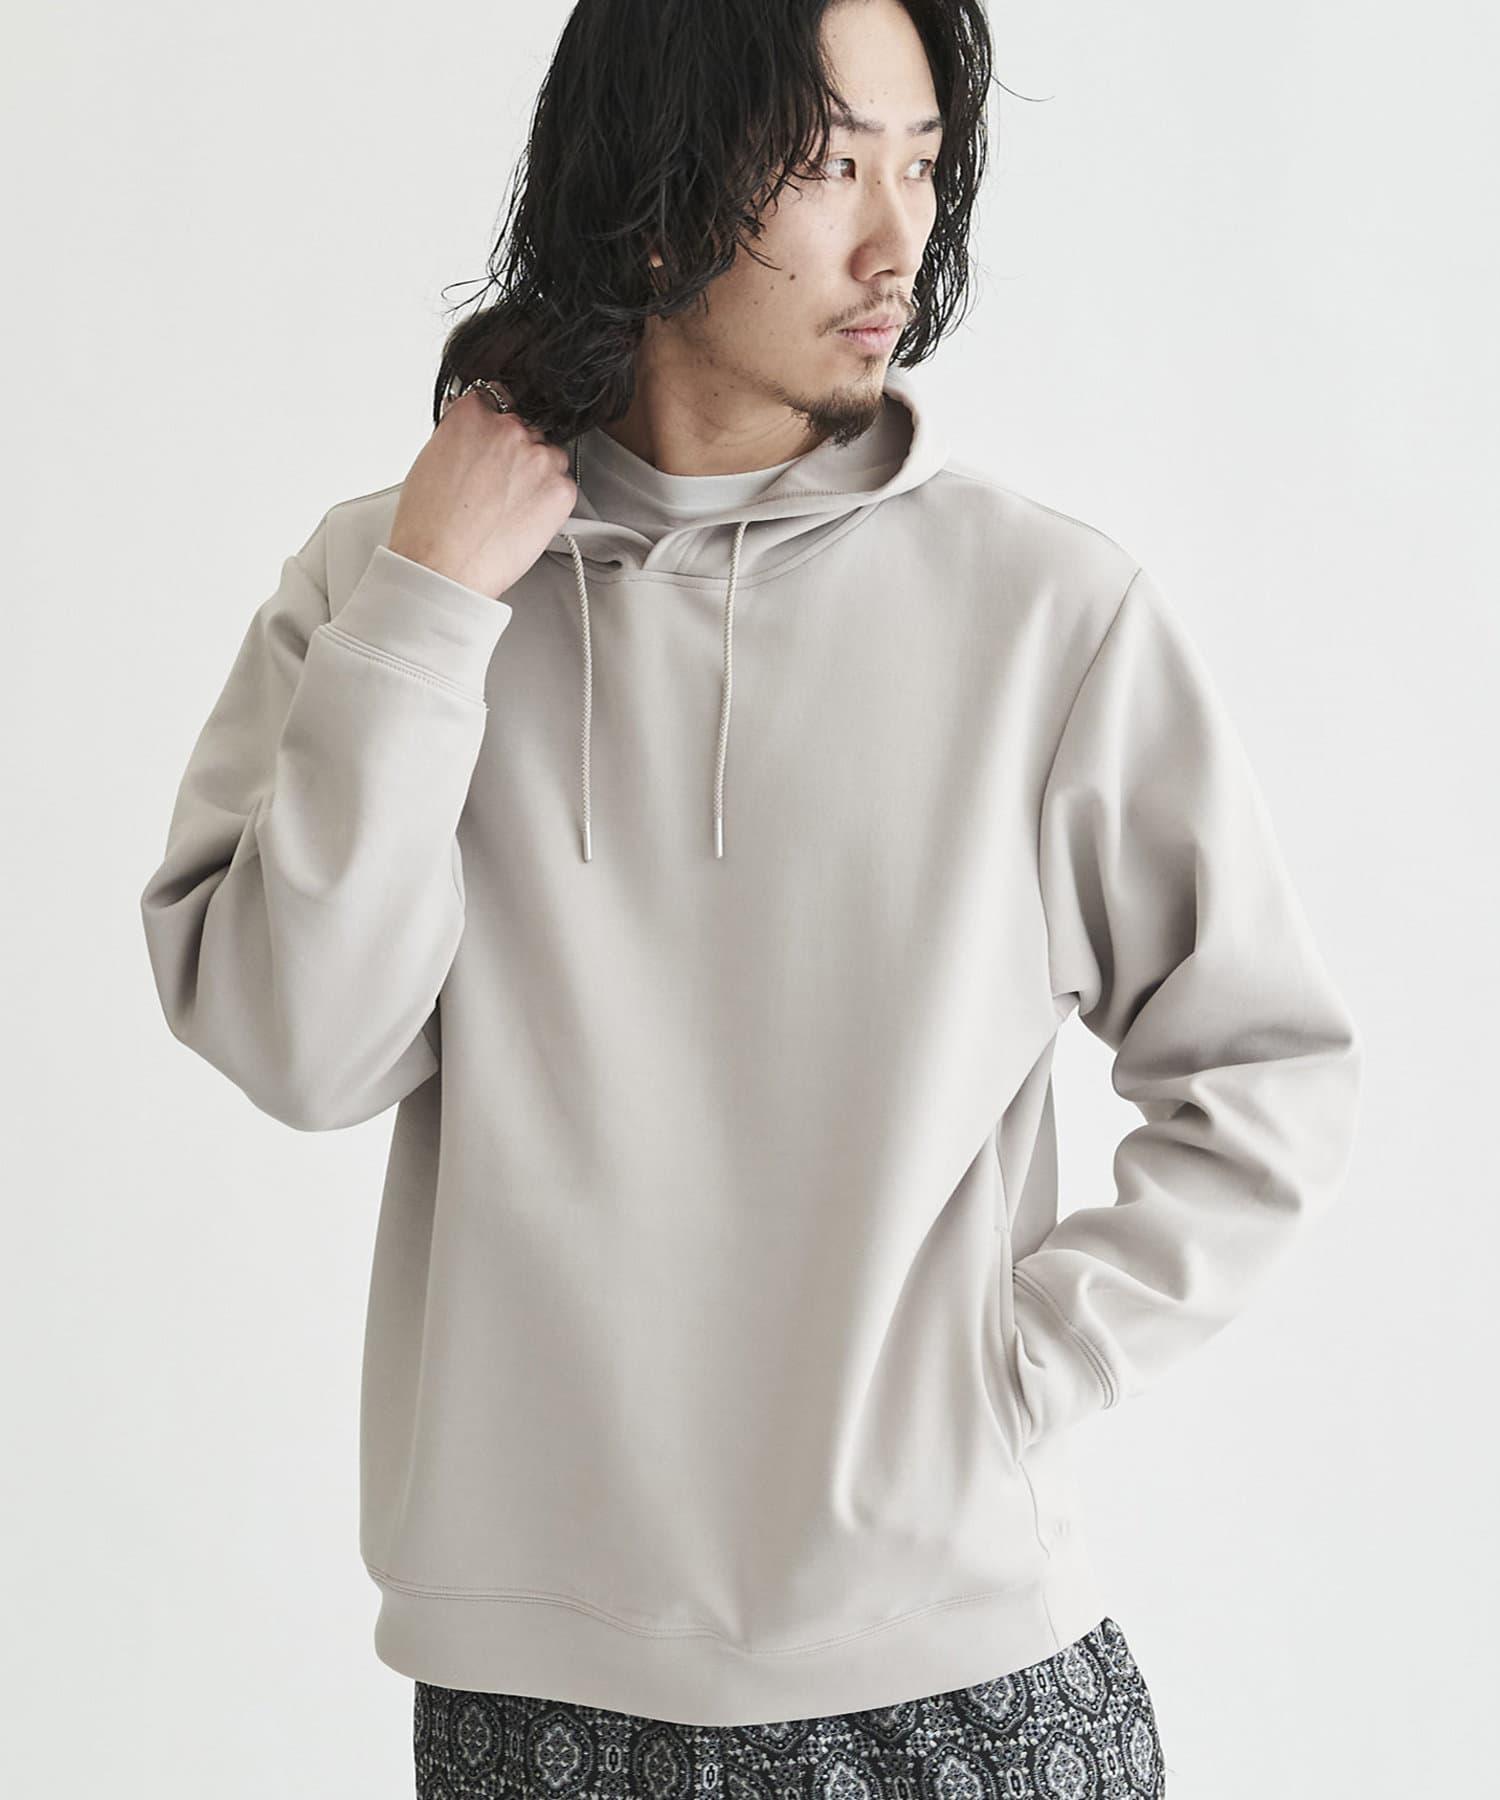 CPCM(シーピーシーエム) 【着心地バツグン】ライトダンボールパーカー